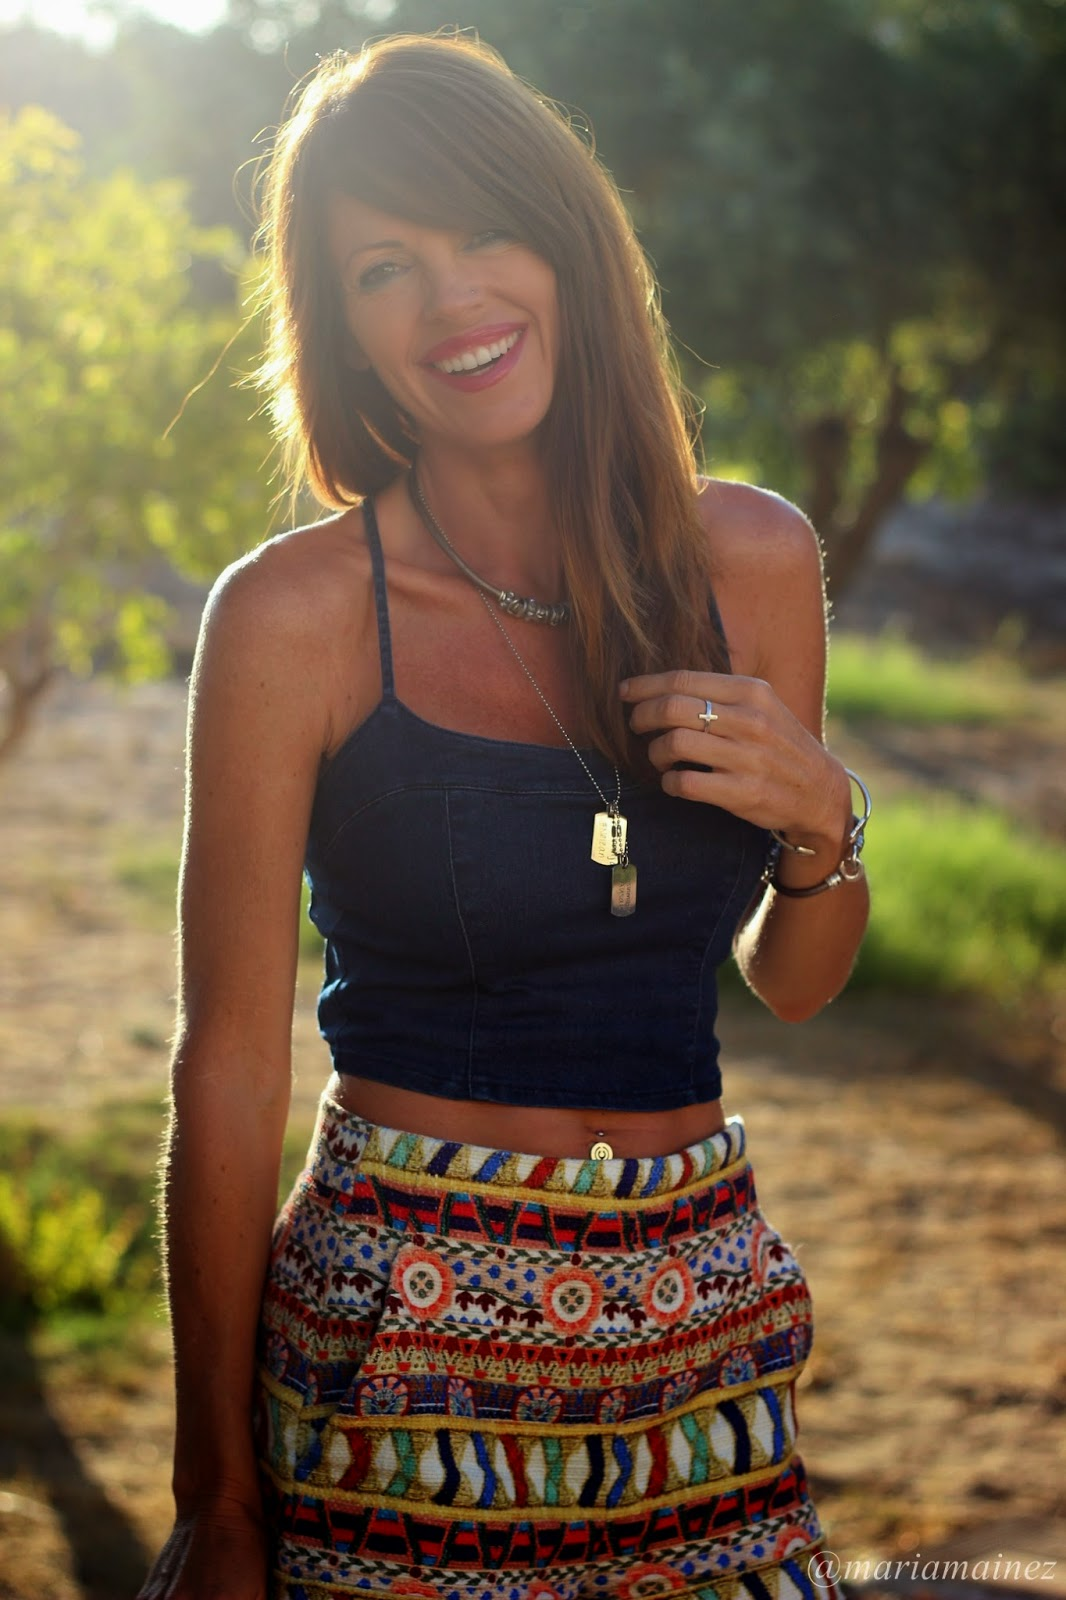 Streetstyle 2014 - Shorts Zara - Crop top denim - Smile